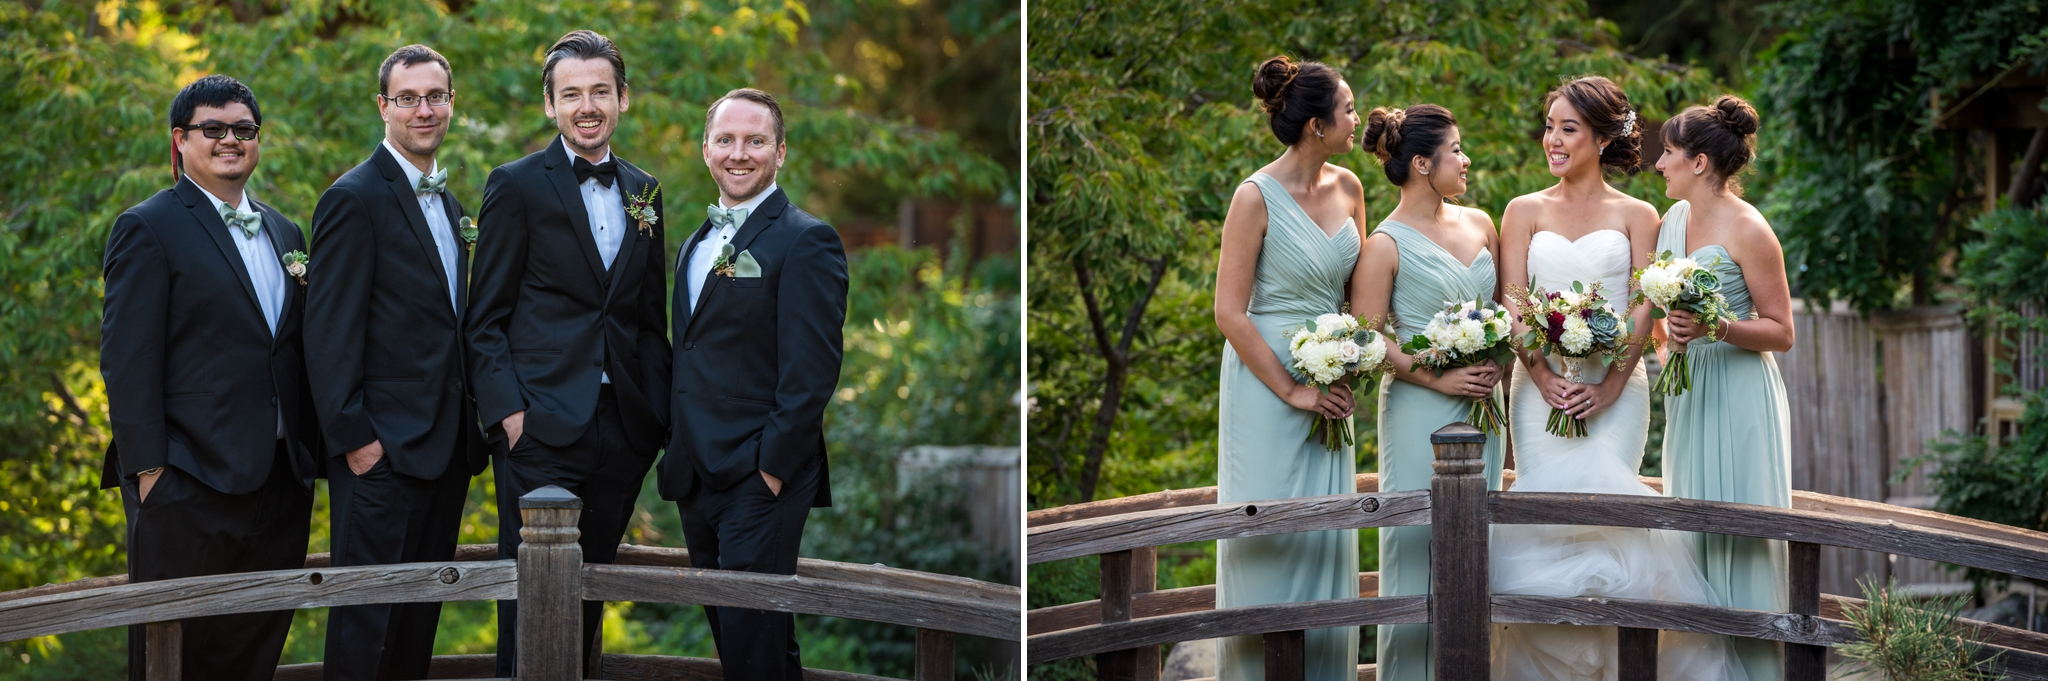 Lancy-Adam-Bridal-Party-Wedding-Hakone-Saratoga-Satvedi-Photography